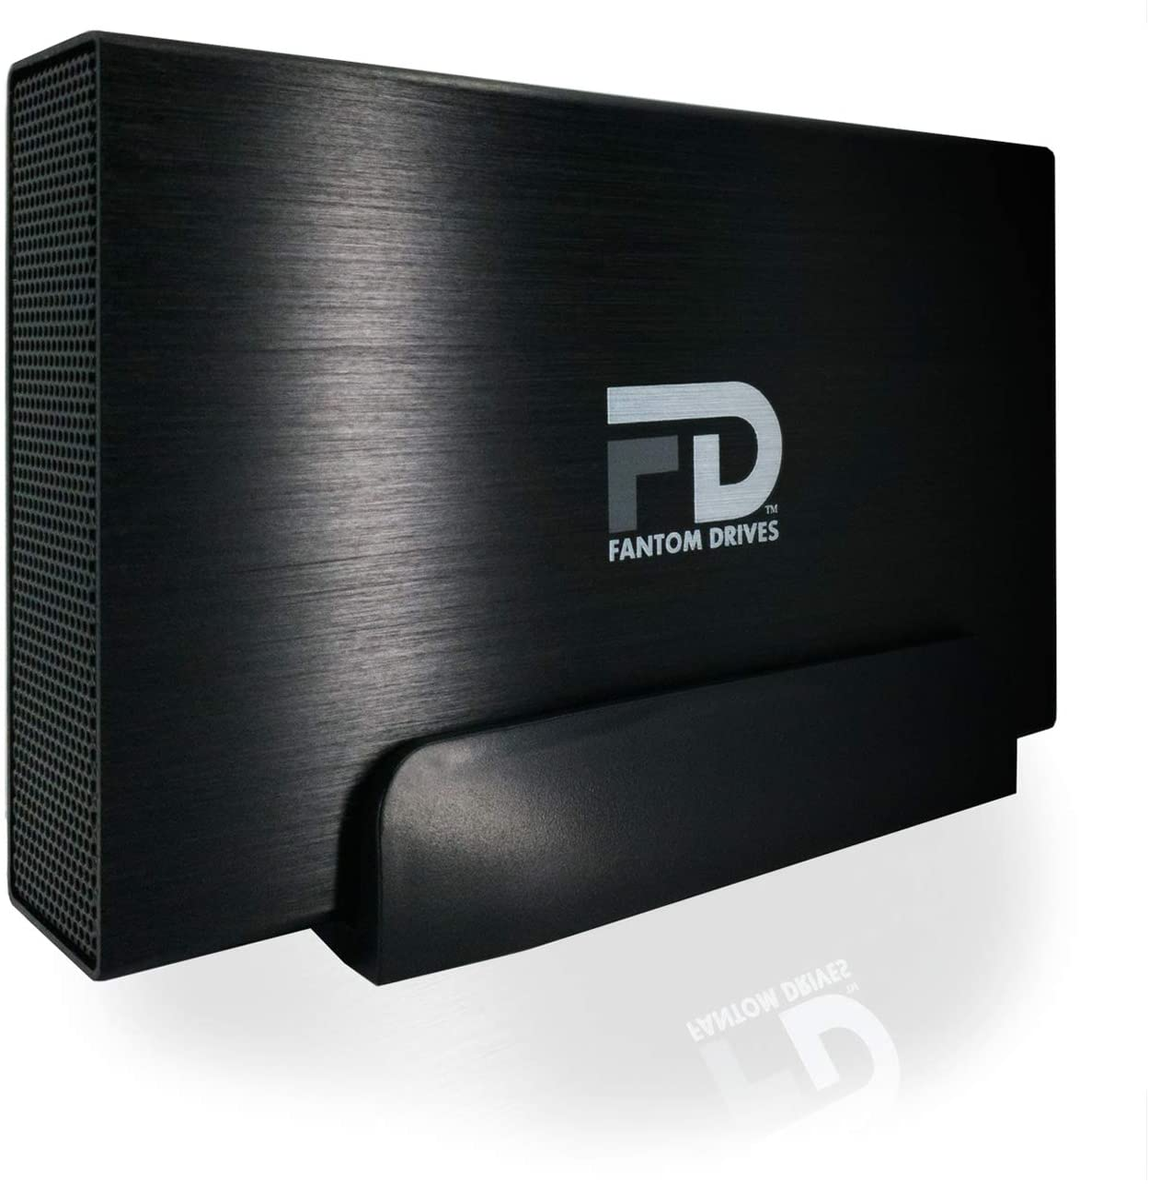 Fantom Drives 500GB External Hard Drive - Super Fast 7200RPM USB 3.0 - Black Aluminum External Hard Drive Compatible with Mac, PC, Xbox One and PS4 - (GF3B500UP)